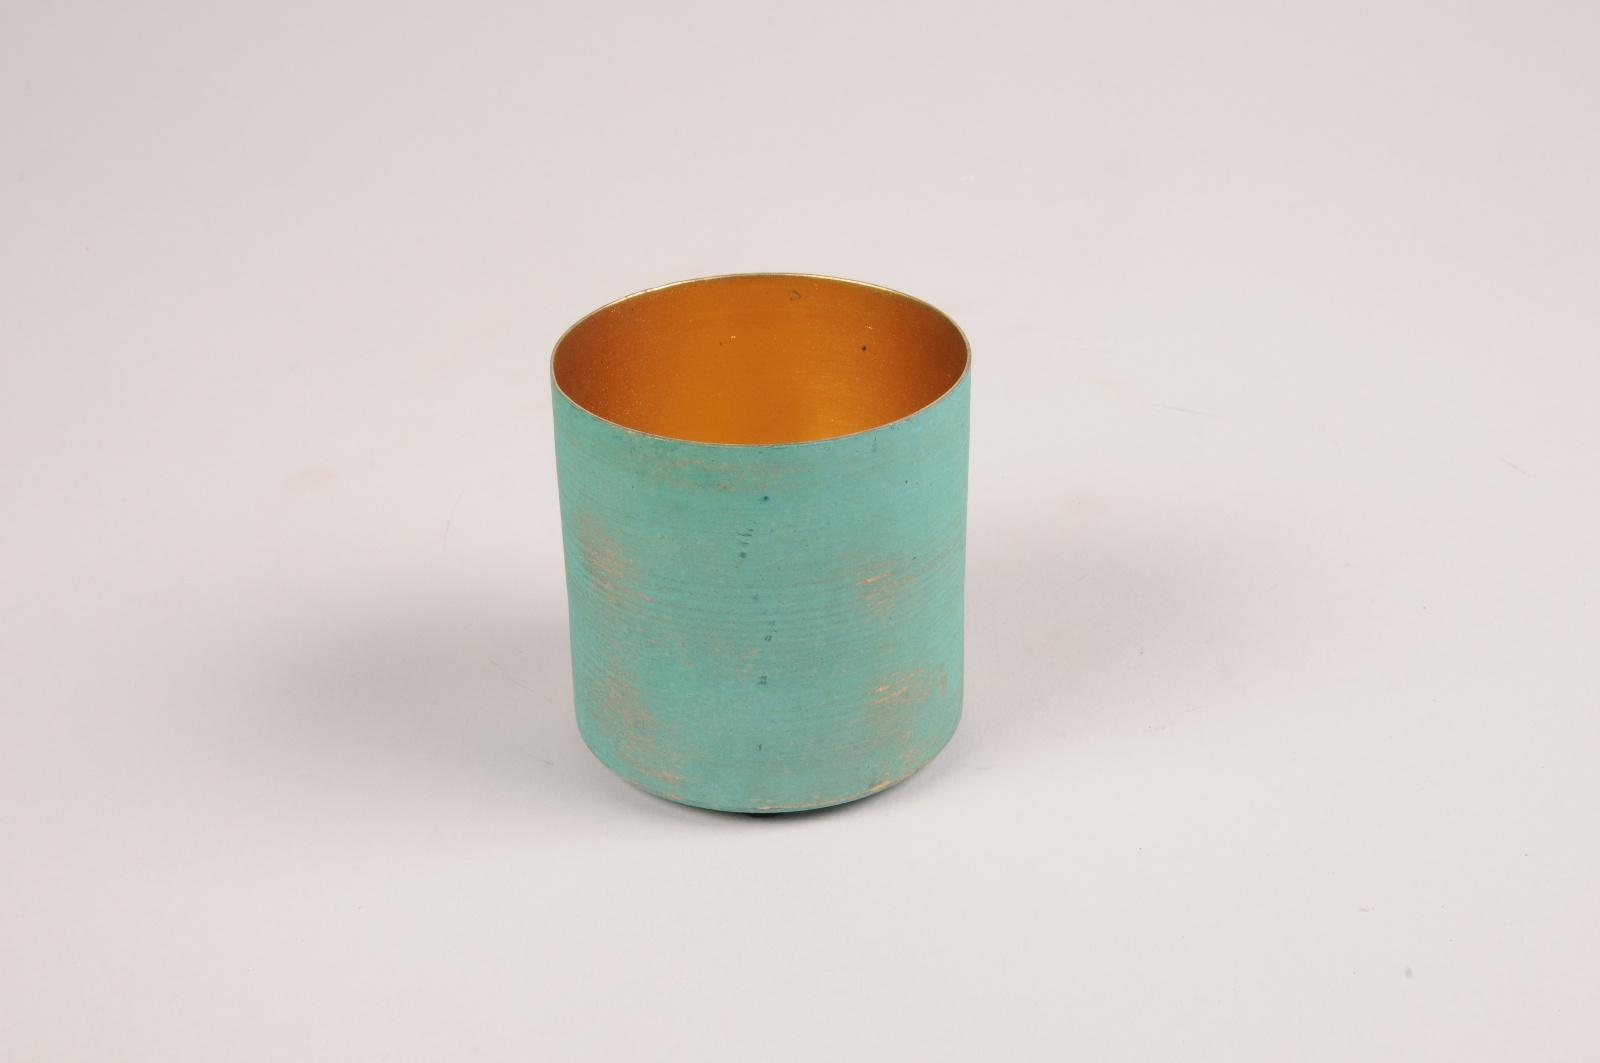 A027JY Green blue metal planter D6.5cm H6.5cm